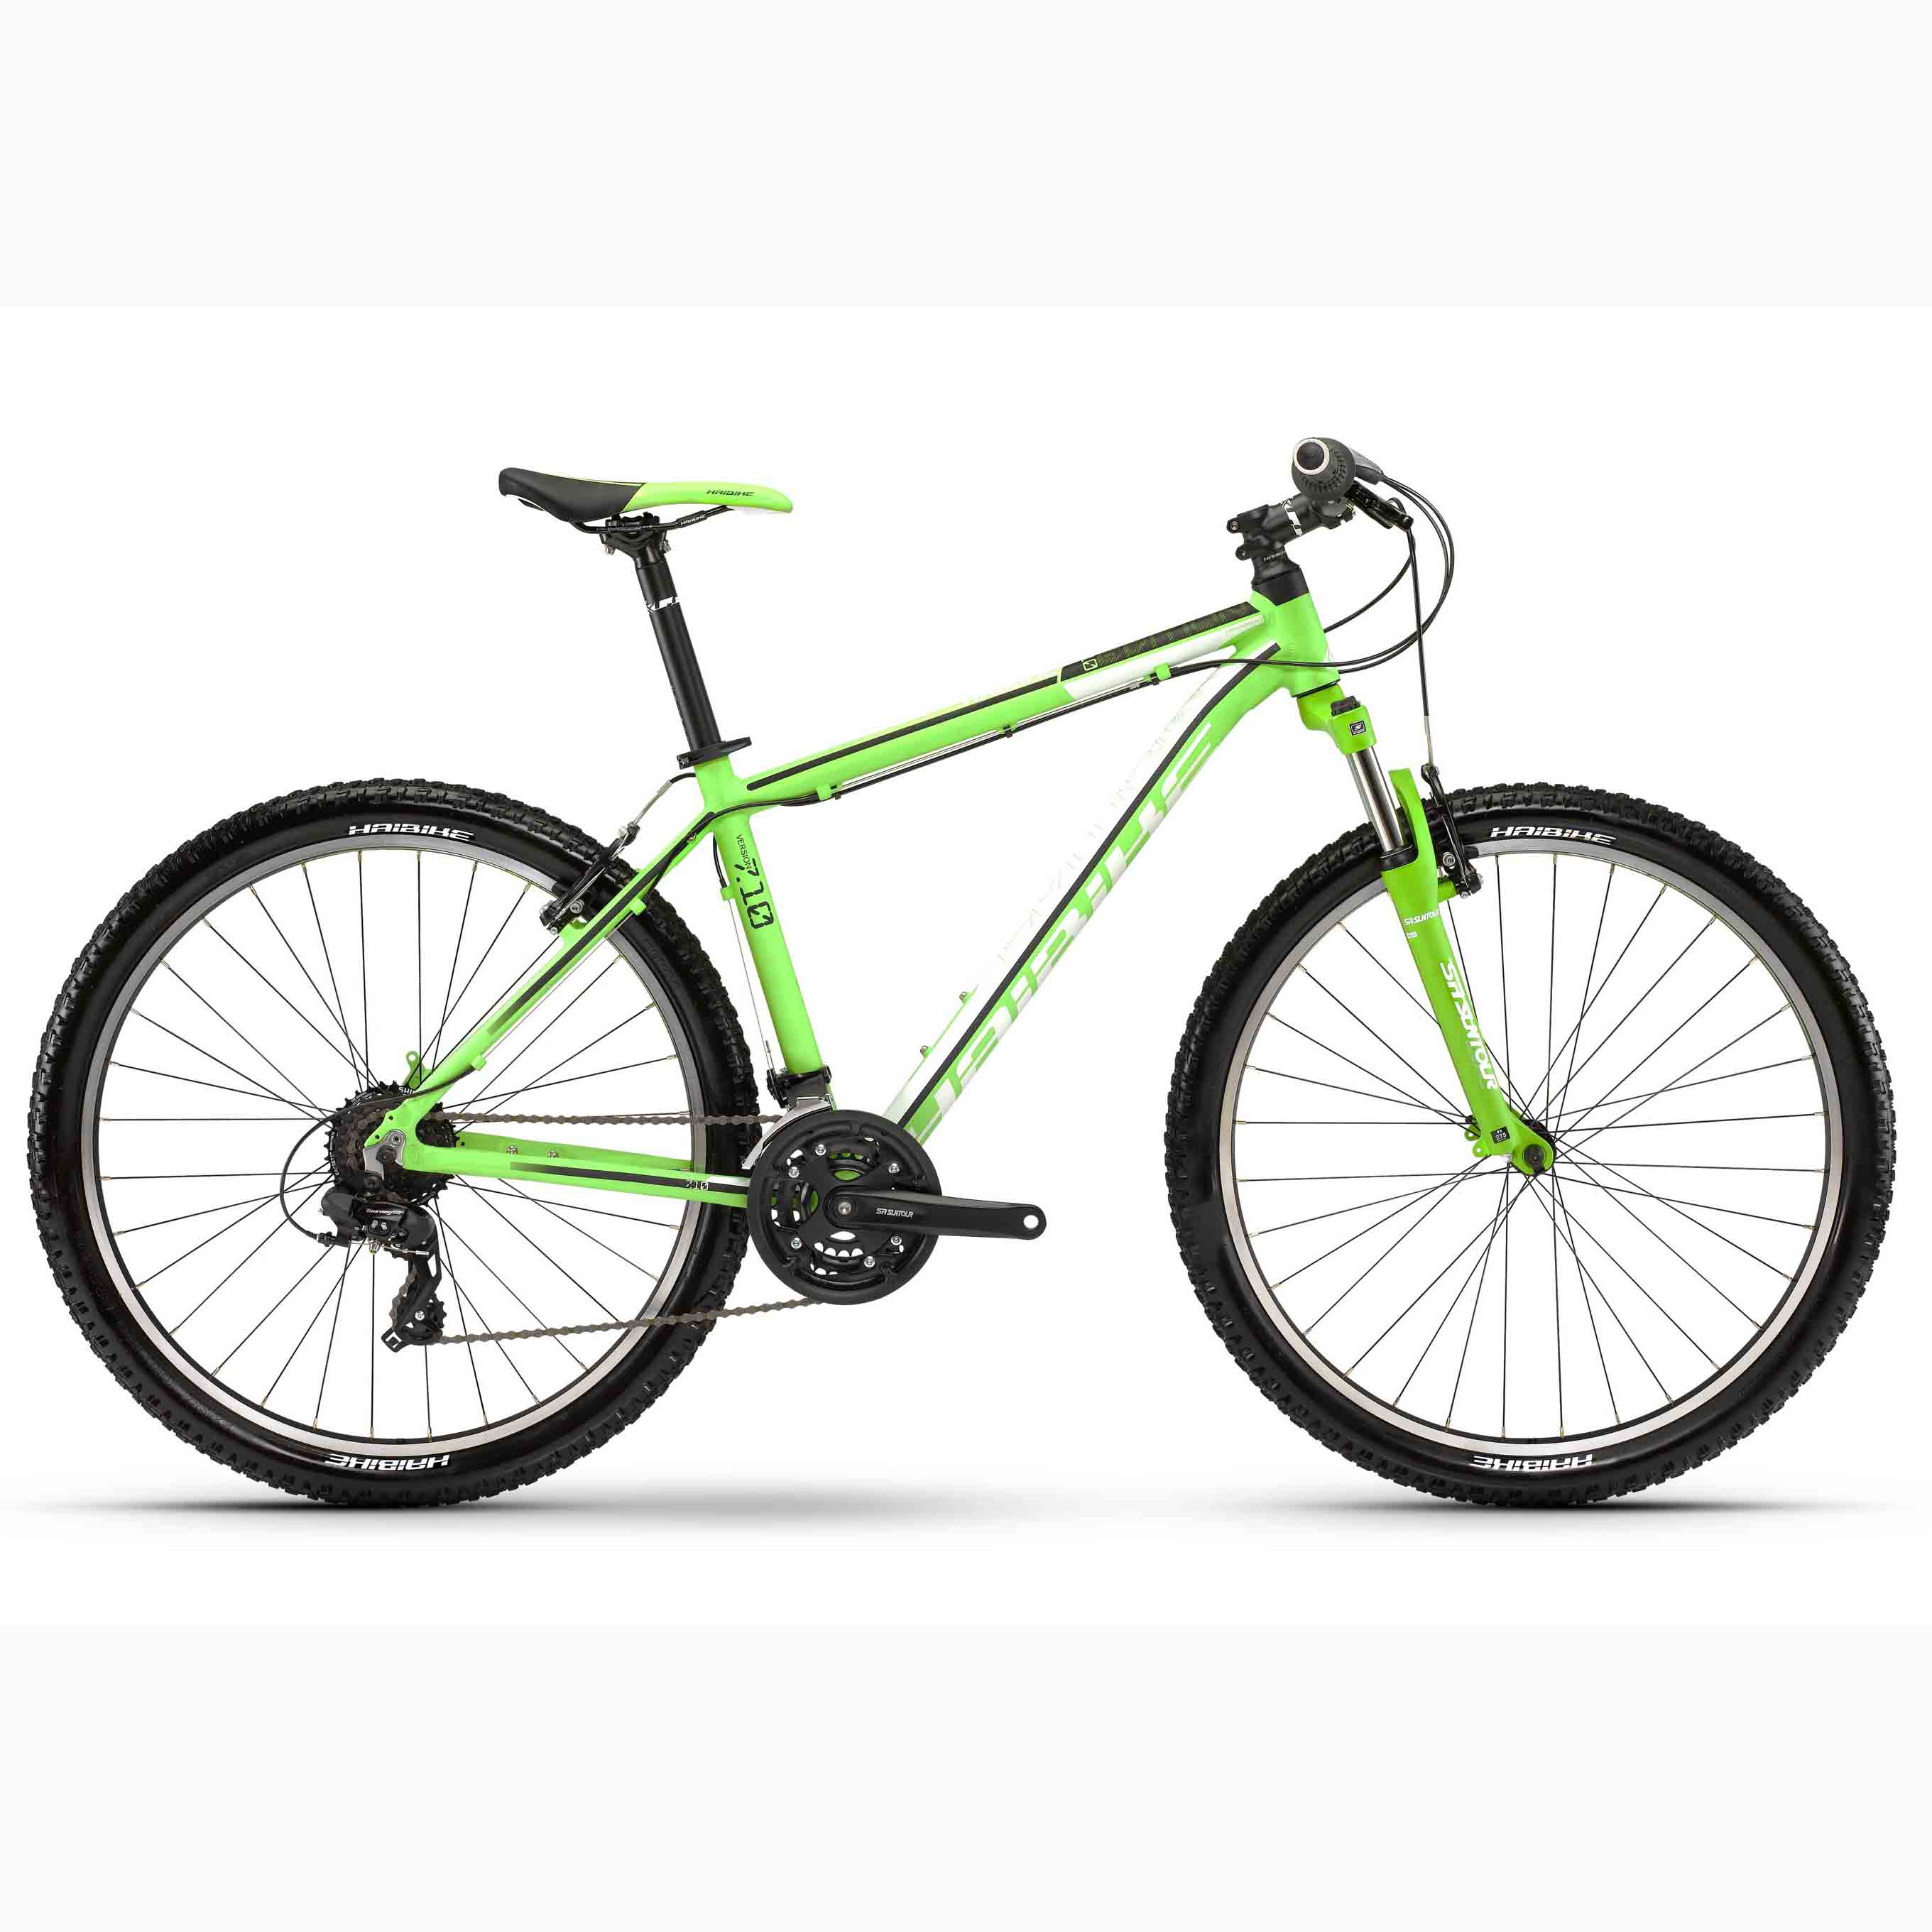 Фото Велосипед Haibike Edition 7.10 27,5″, рама 45см, 2016